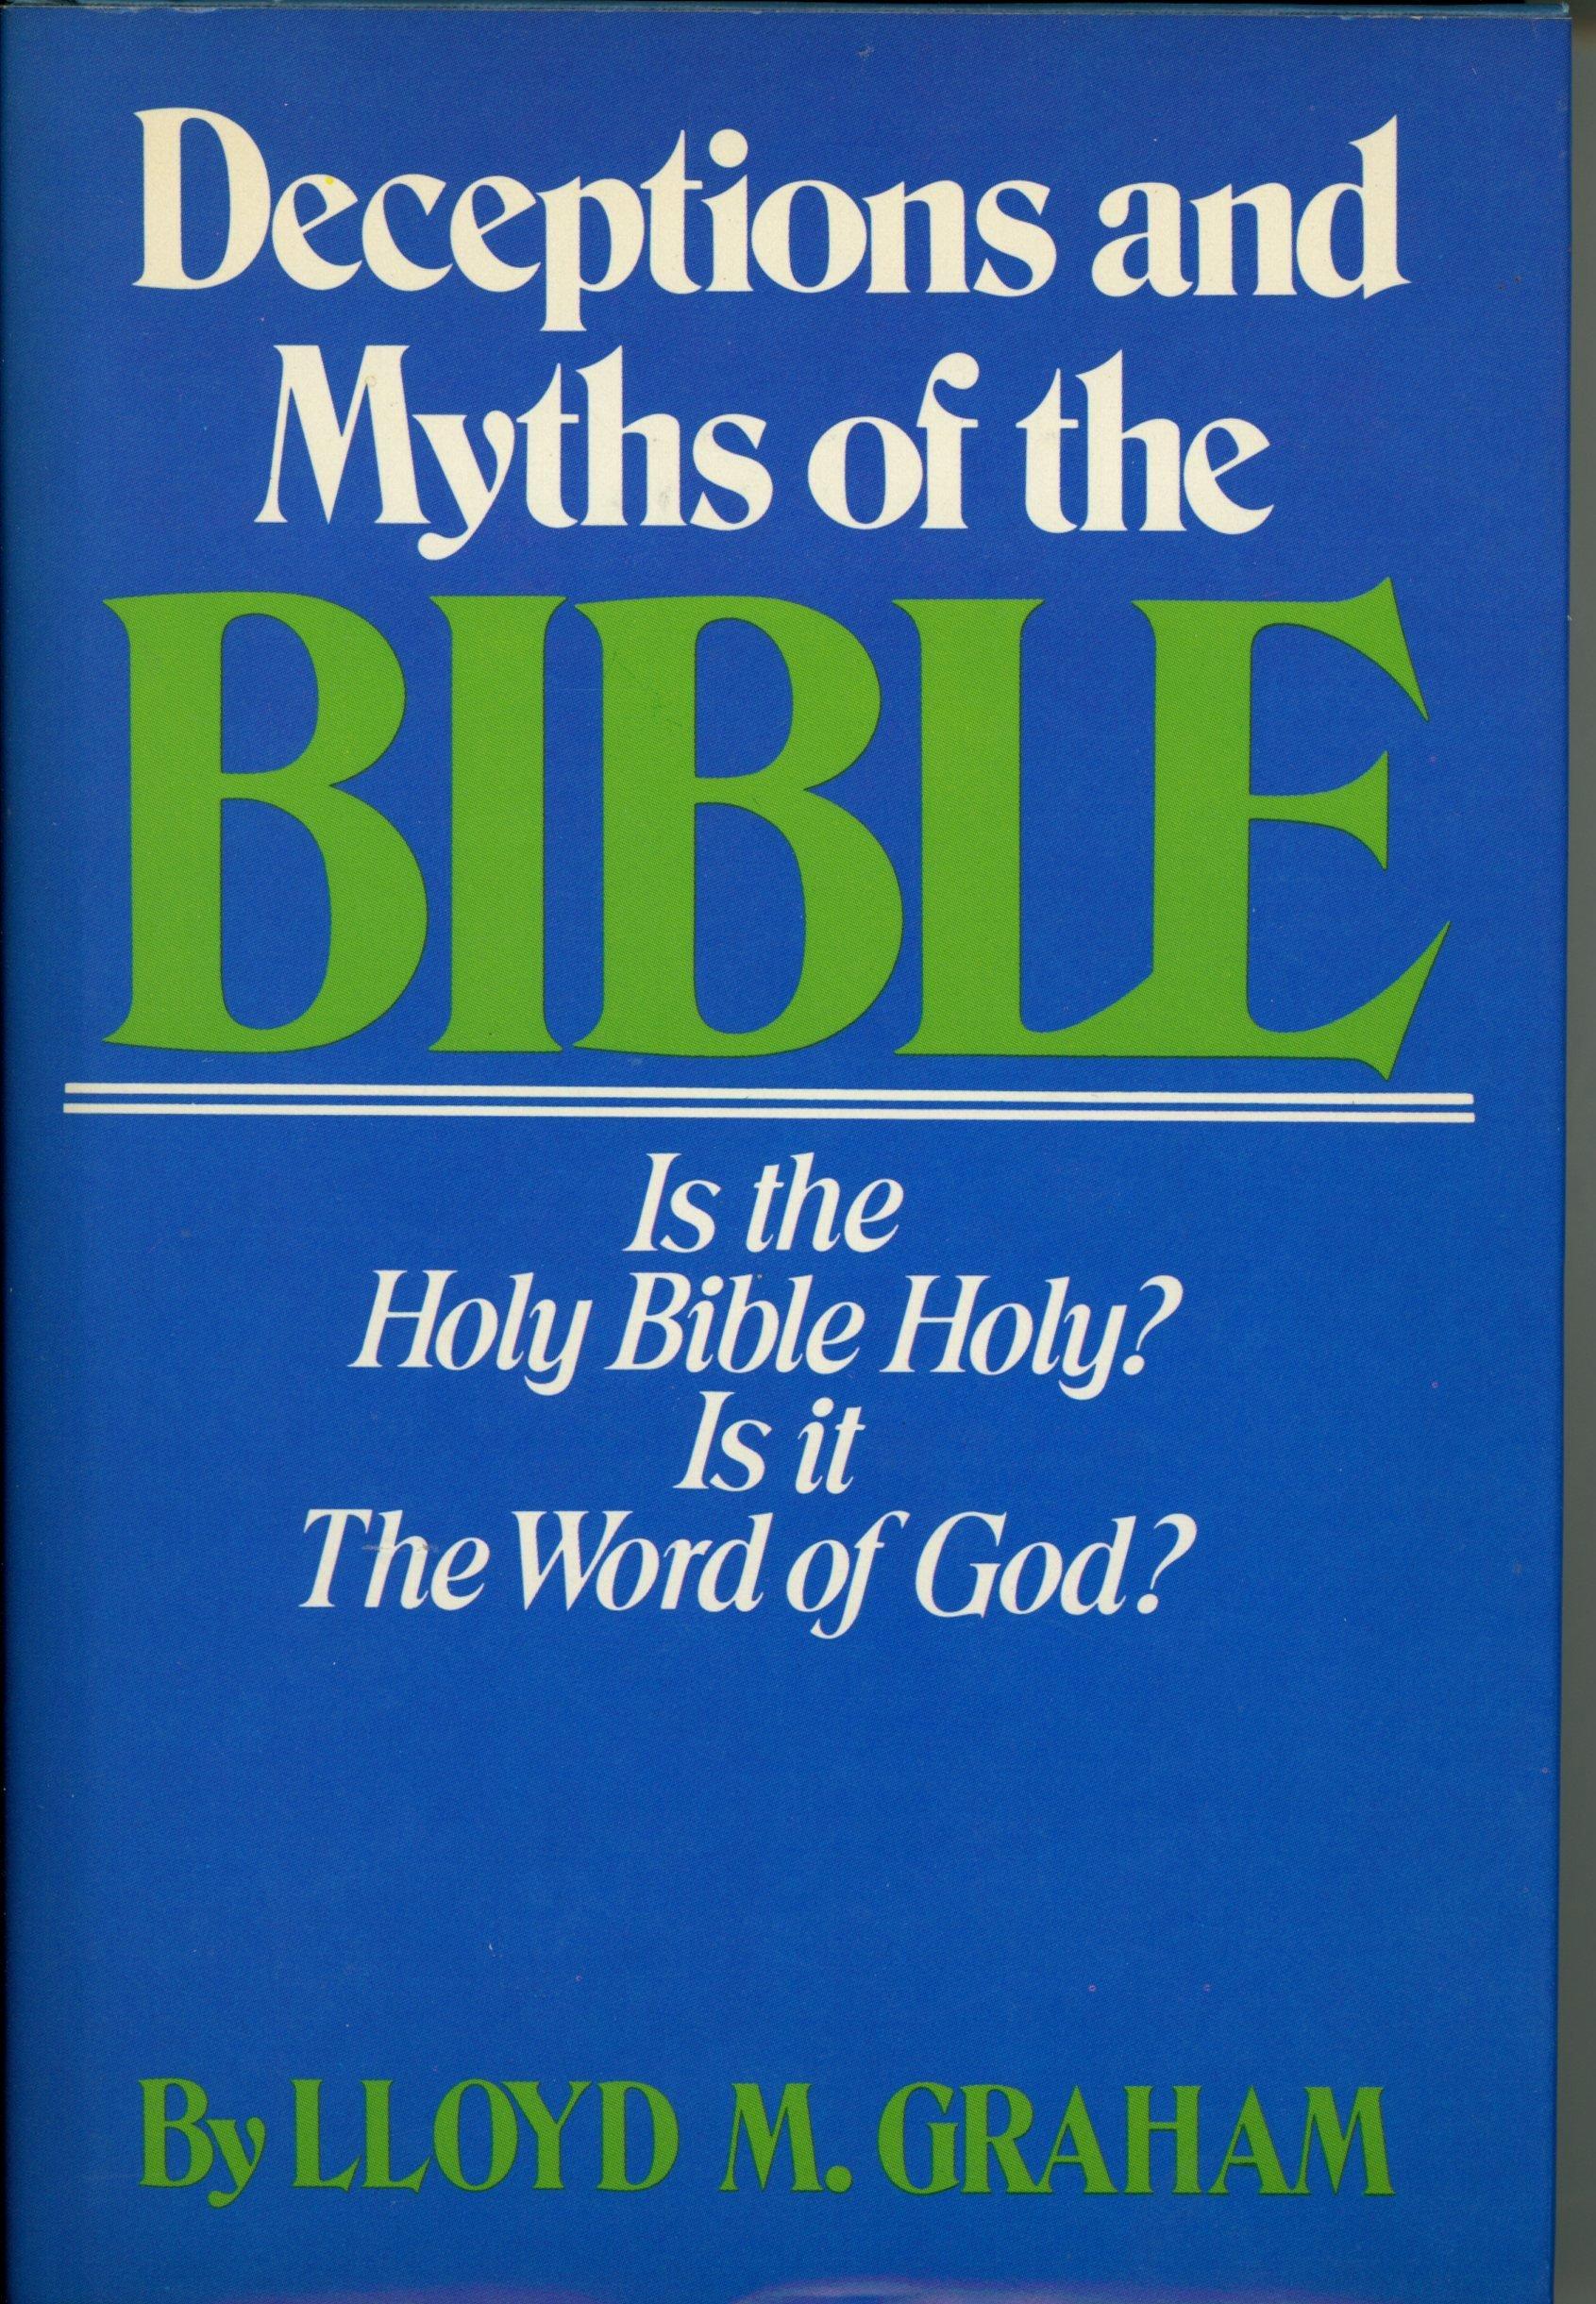 Deceptions & Myths Of The Bible: Lloyd M. Graham: 9780517278345:  Amazon.com: Books